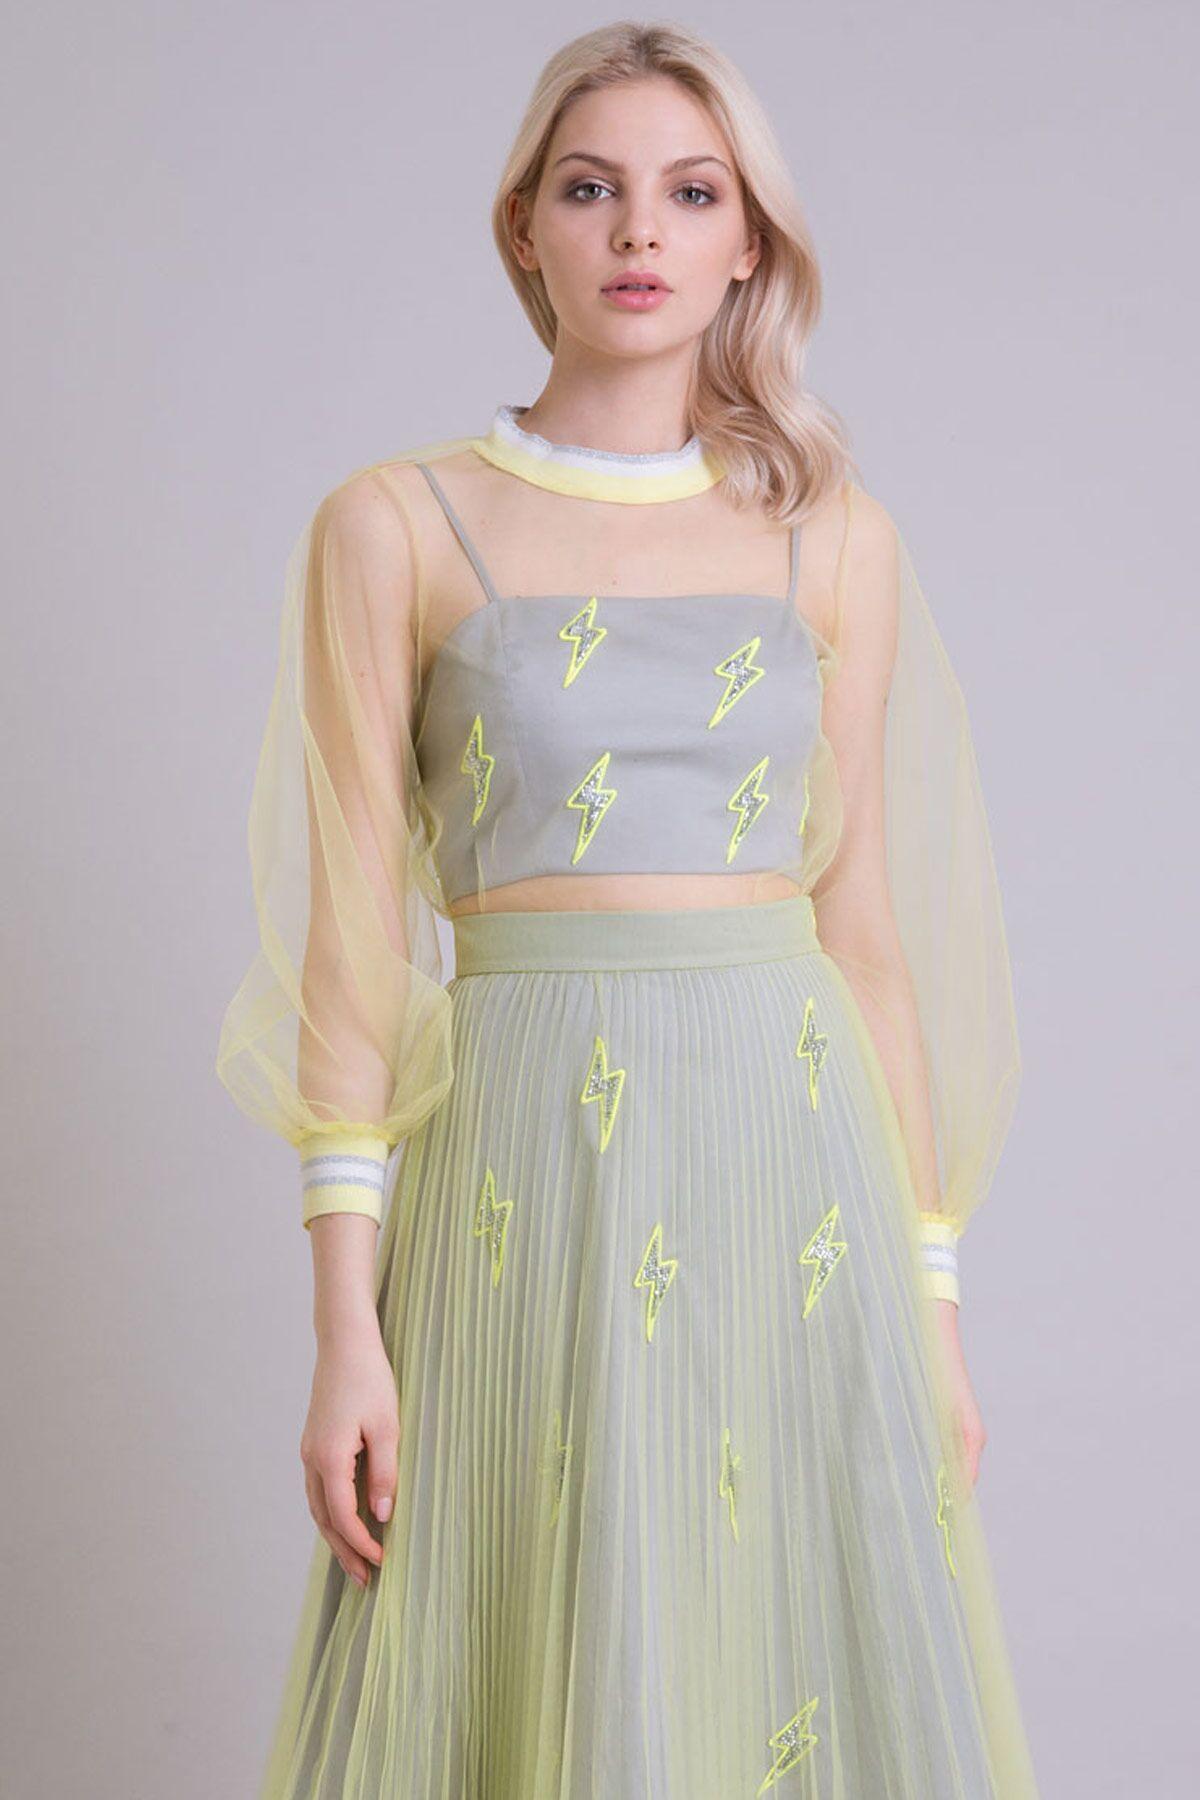 Triko Detaylı Neon Sarı Tül Sweatshirt